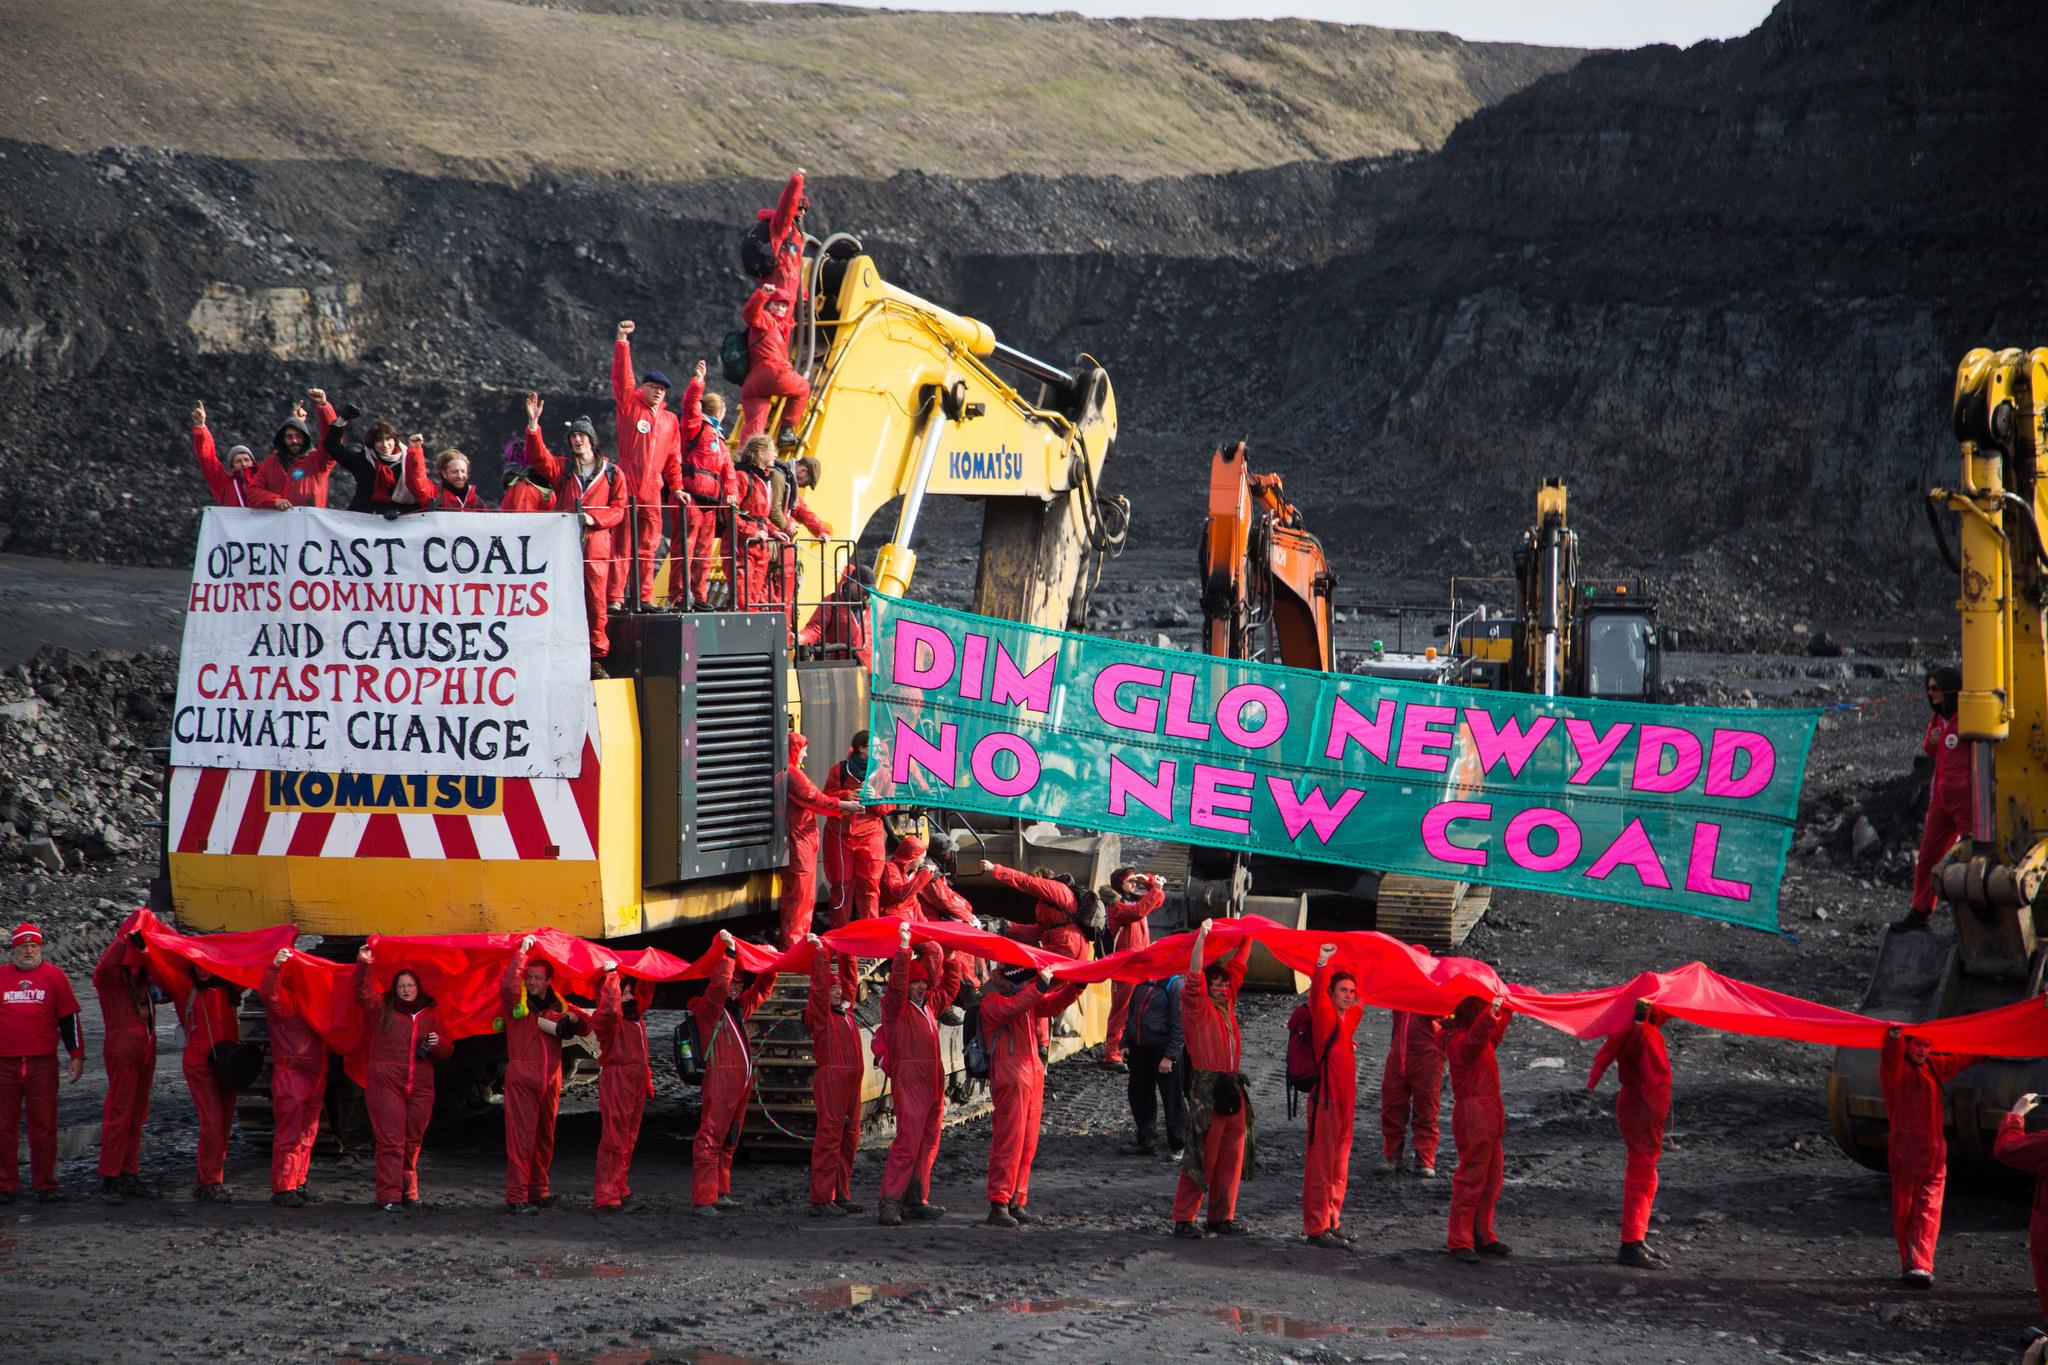 300 people shut down the UK's largest opencast coal mine Photographer: Kristian Buus